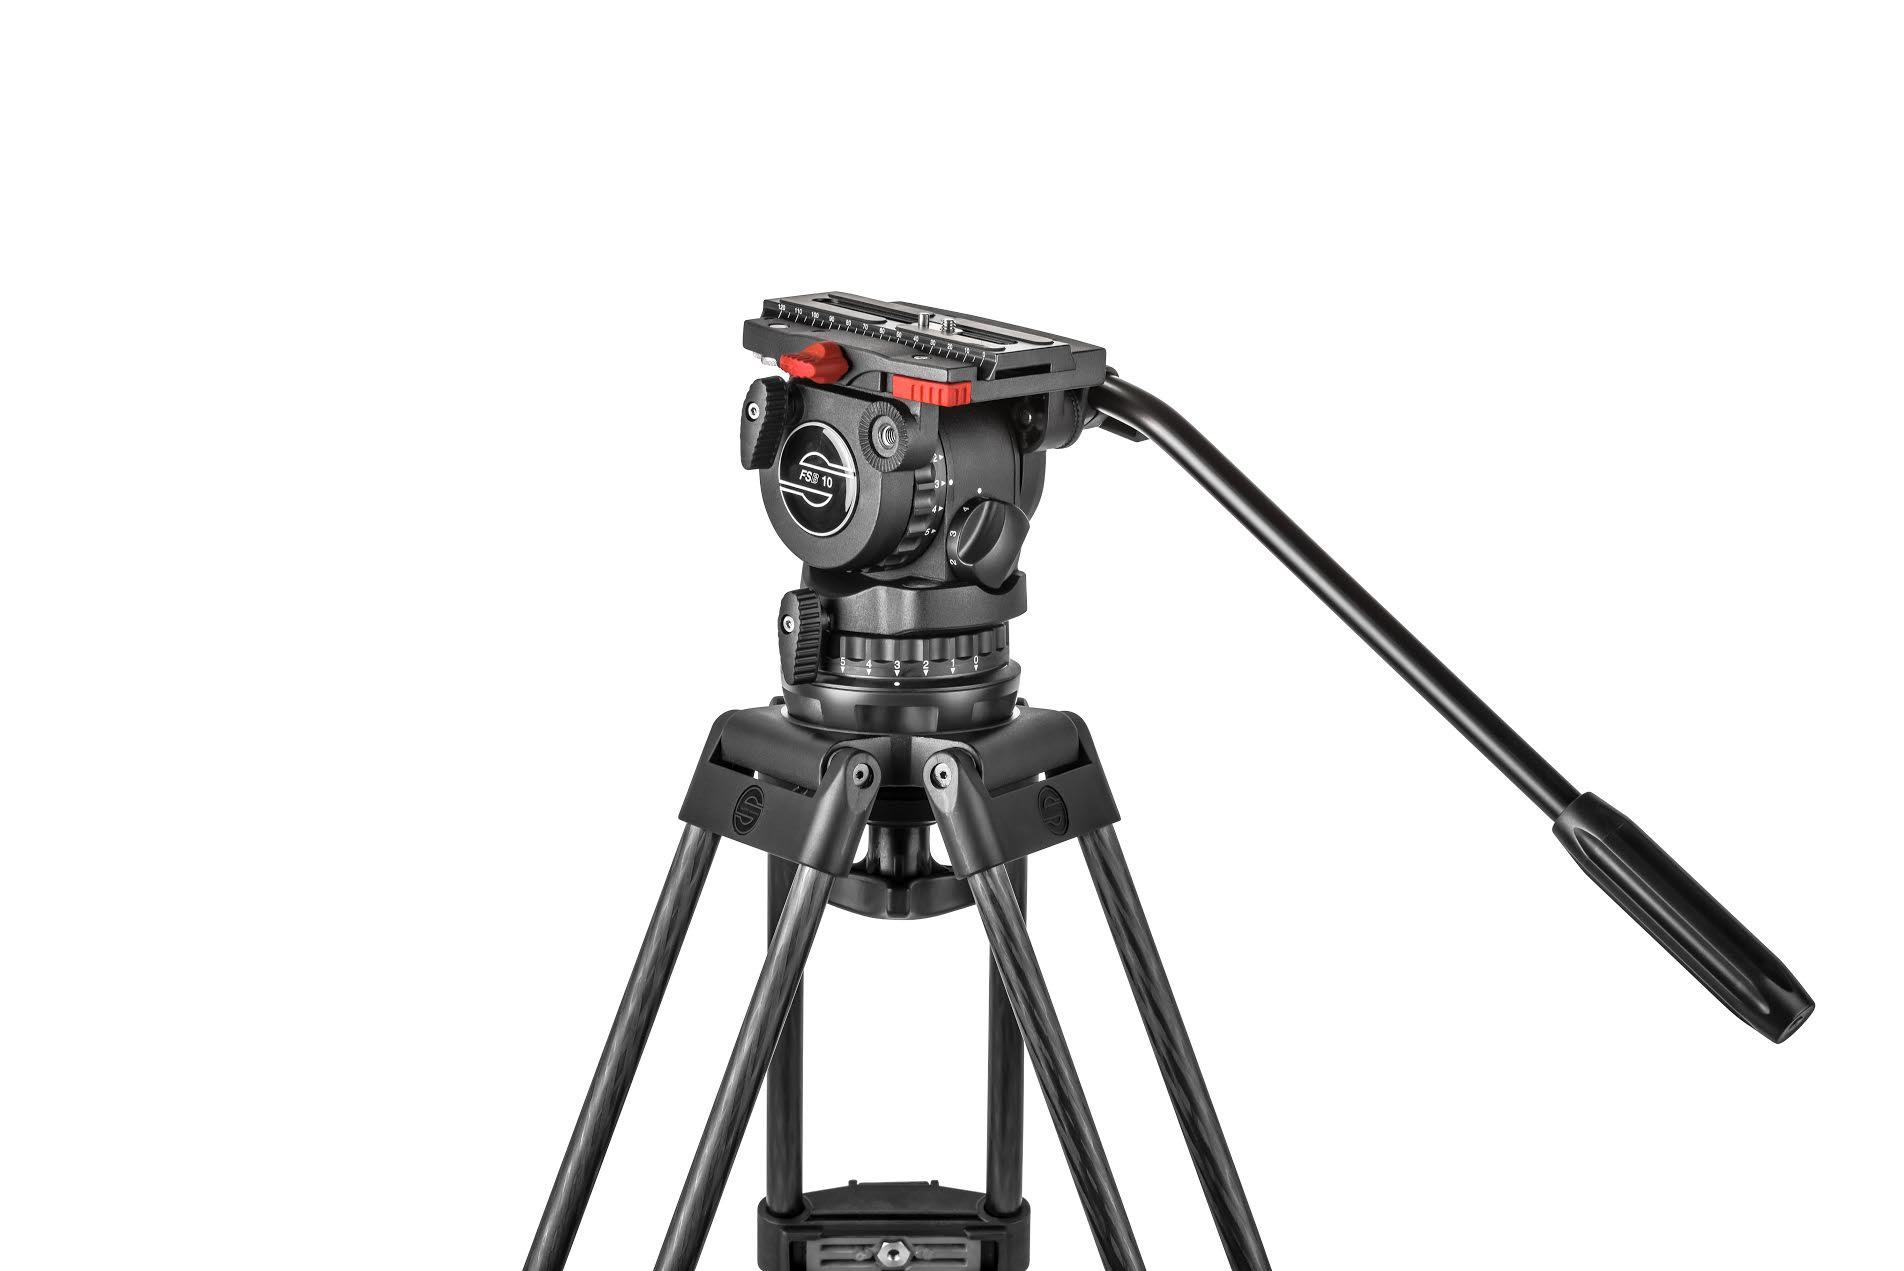 Sachtler announces more affordable FSB 10 100mm fluid head tripod